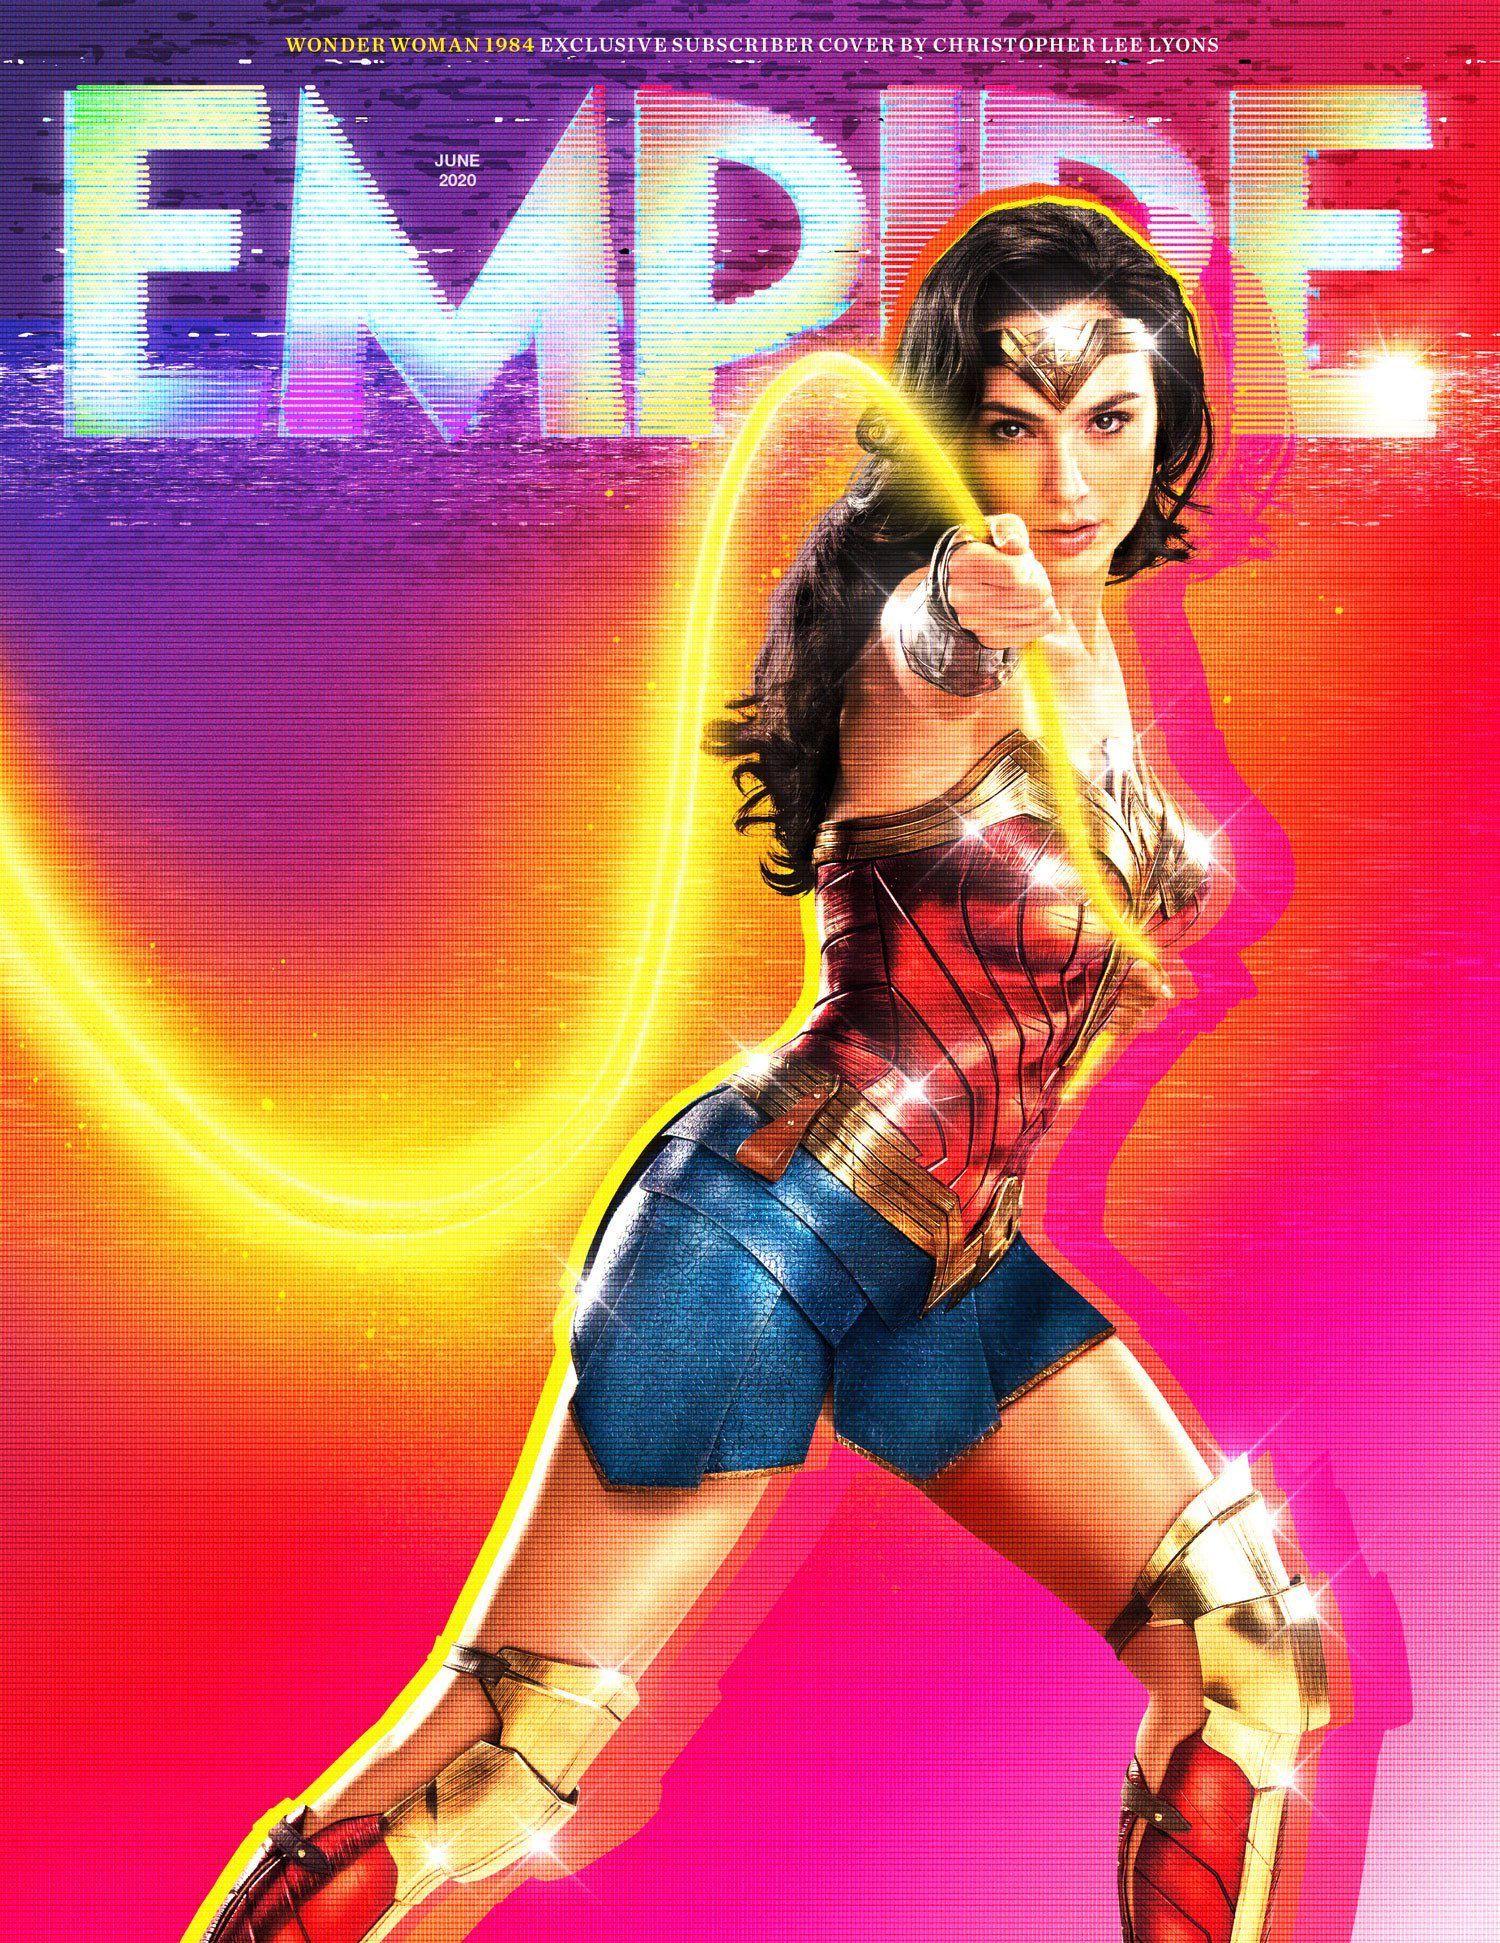 Wonder Woman News On Twitter In 2020 Wonder Woman Wonder Woman Movie Gal Gadot Wonder Woman